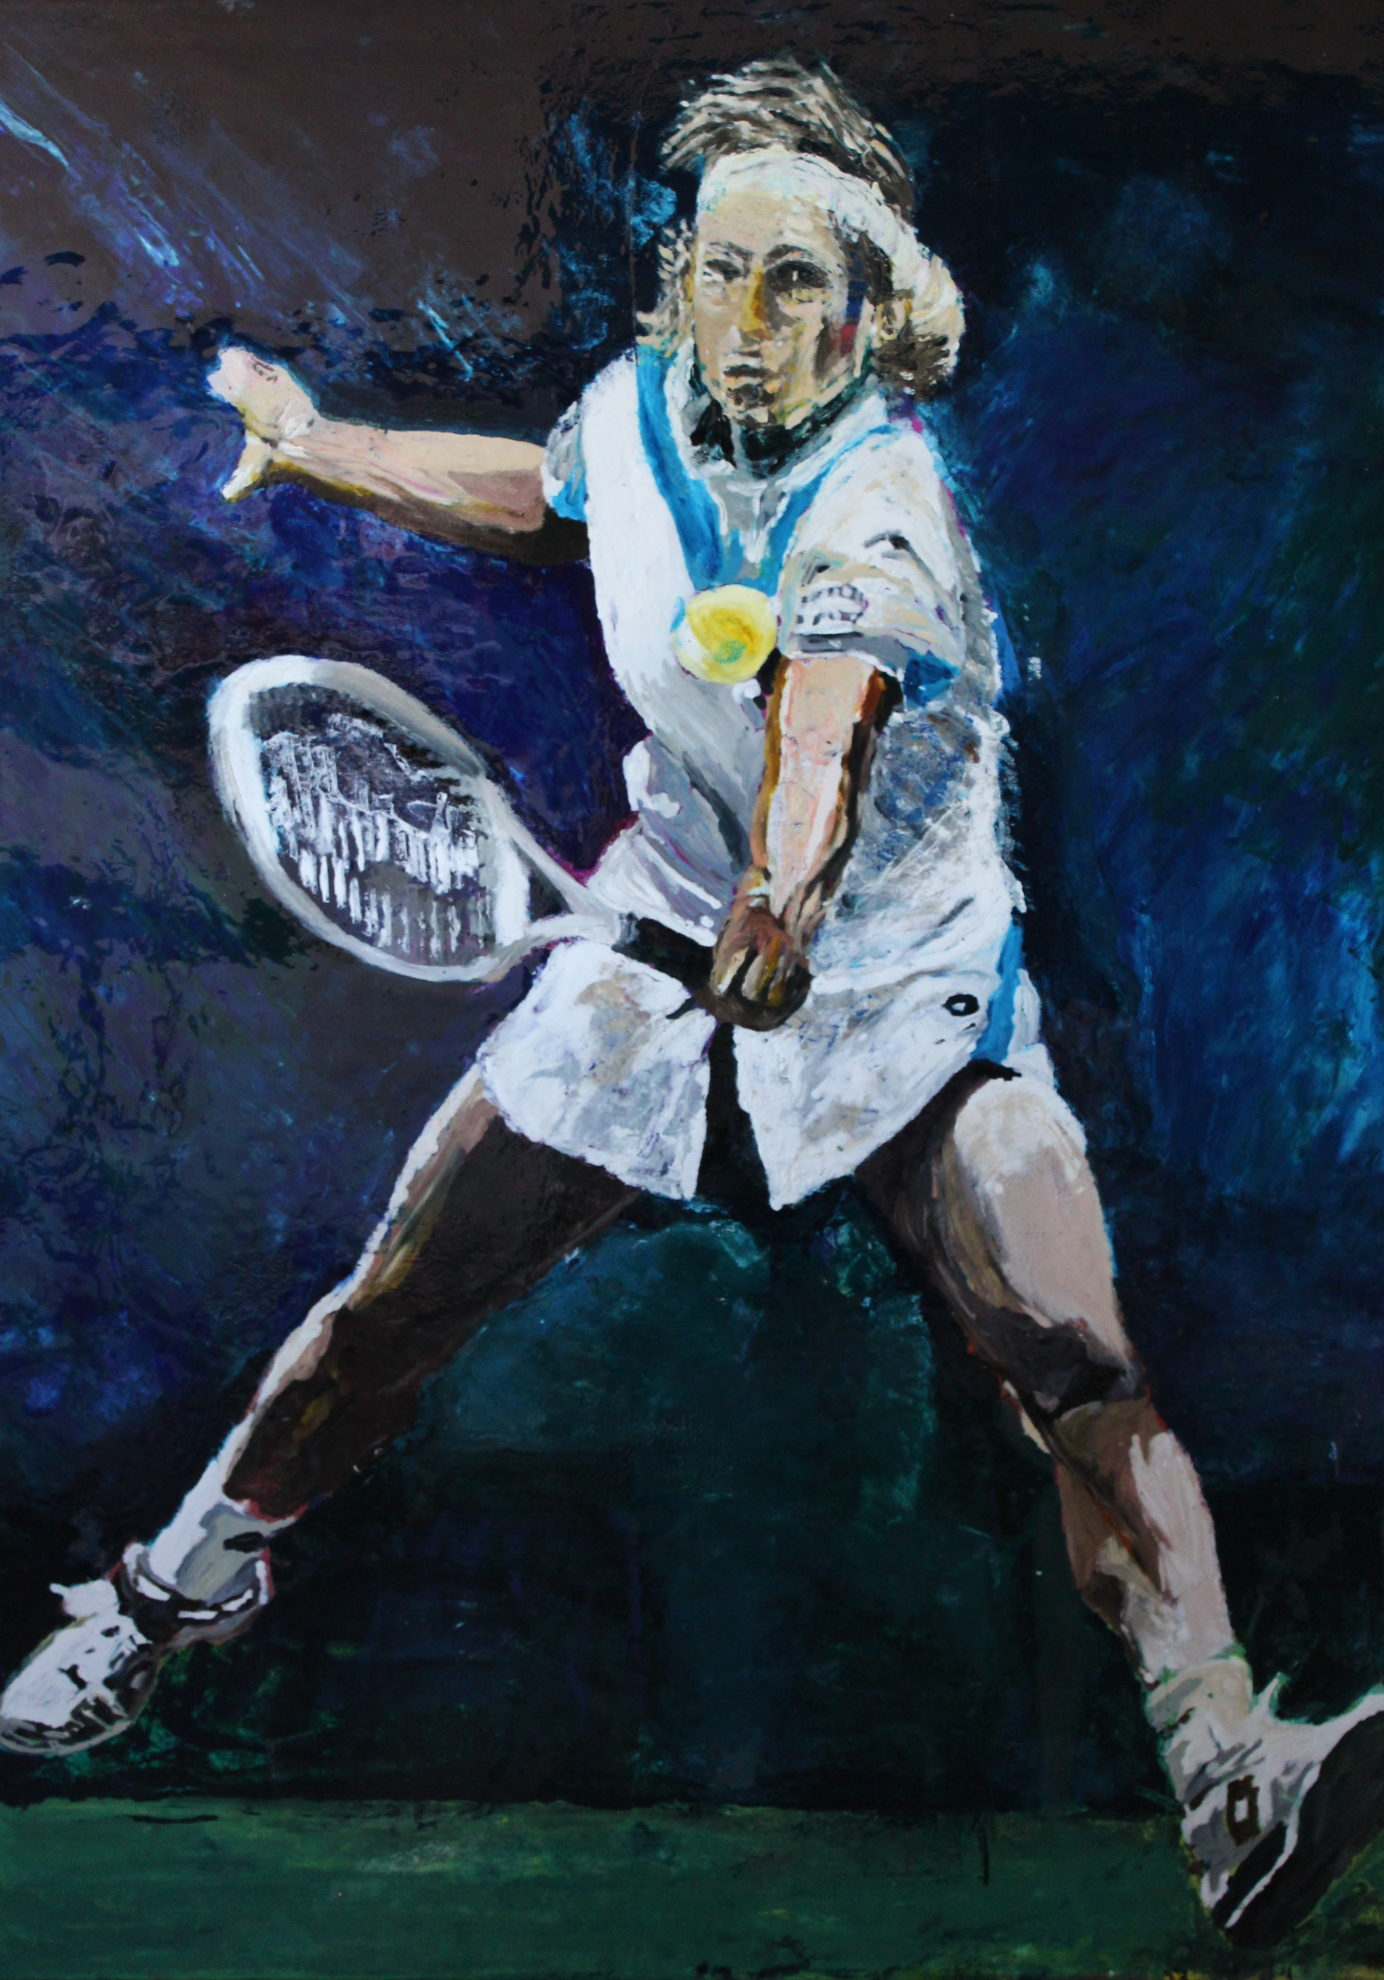 Martina Navratilova, 1983 US Open Champion